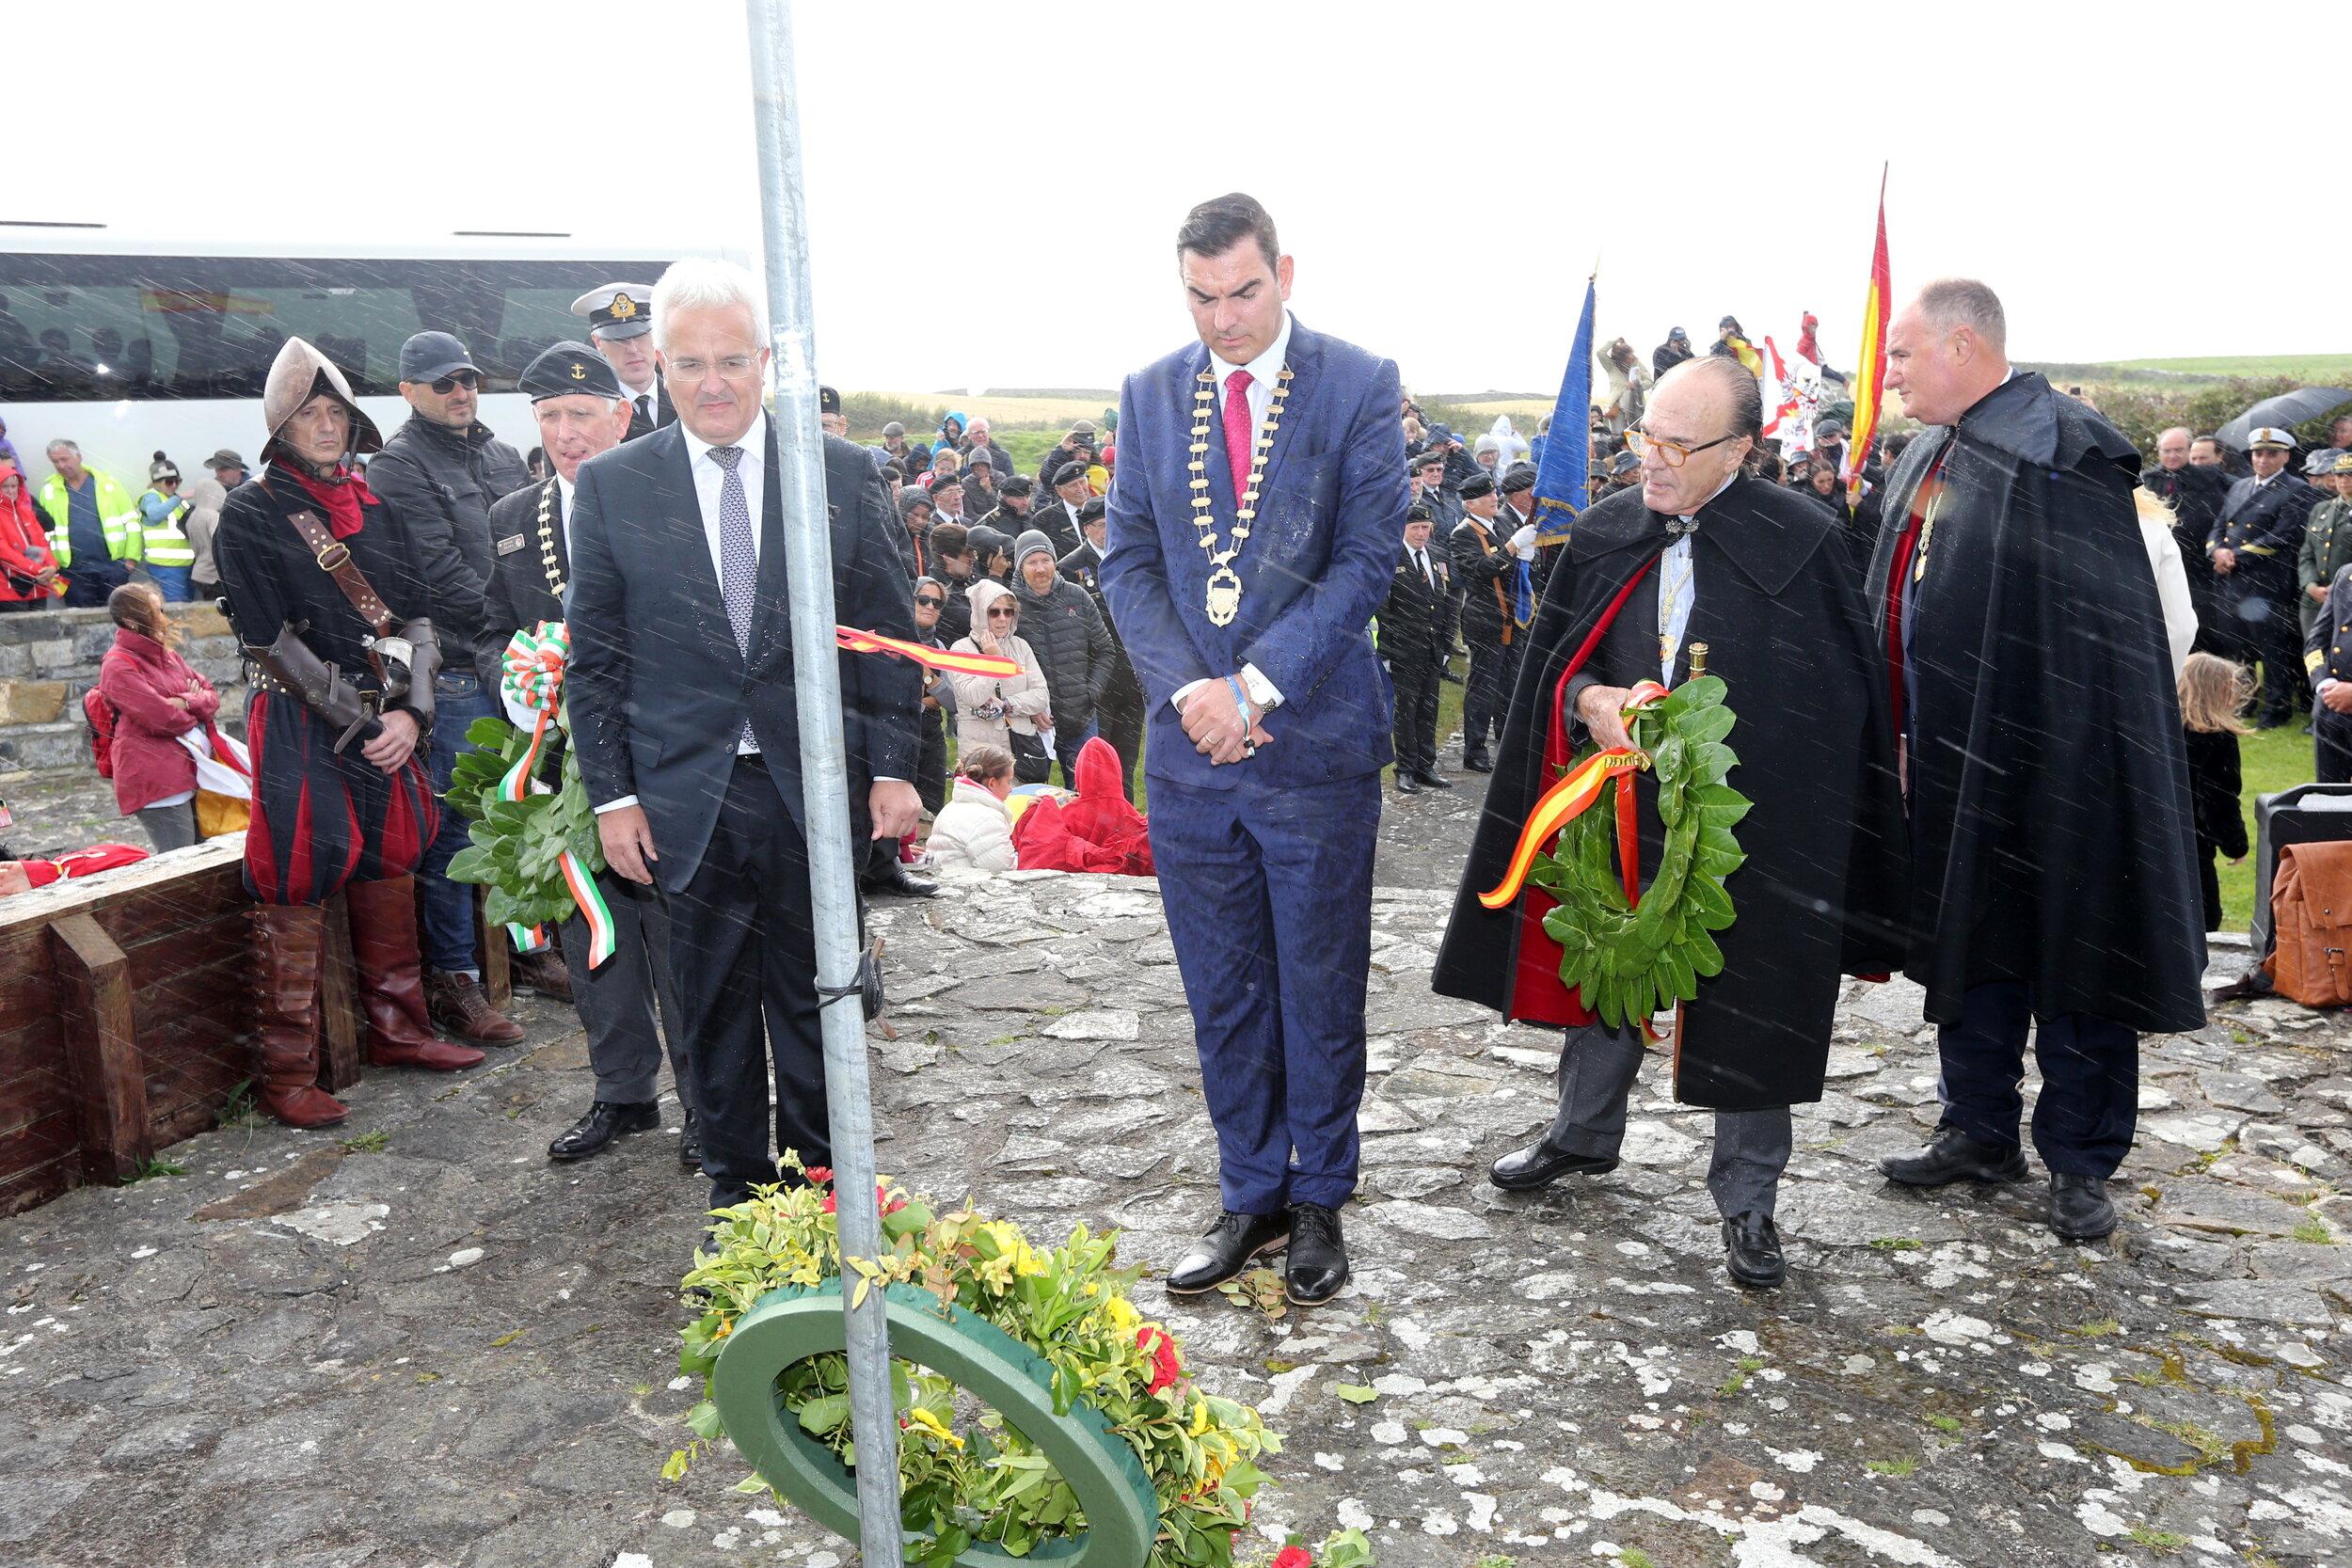 Spanish Ambassador to ireland Mr. Indefonso Castro and Cathaoirleach of Sligo County Council Mr. Tom McSharry lay a wreath in memory of the Spanish Armada of 1588 - photo Charlie Brady